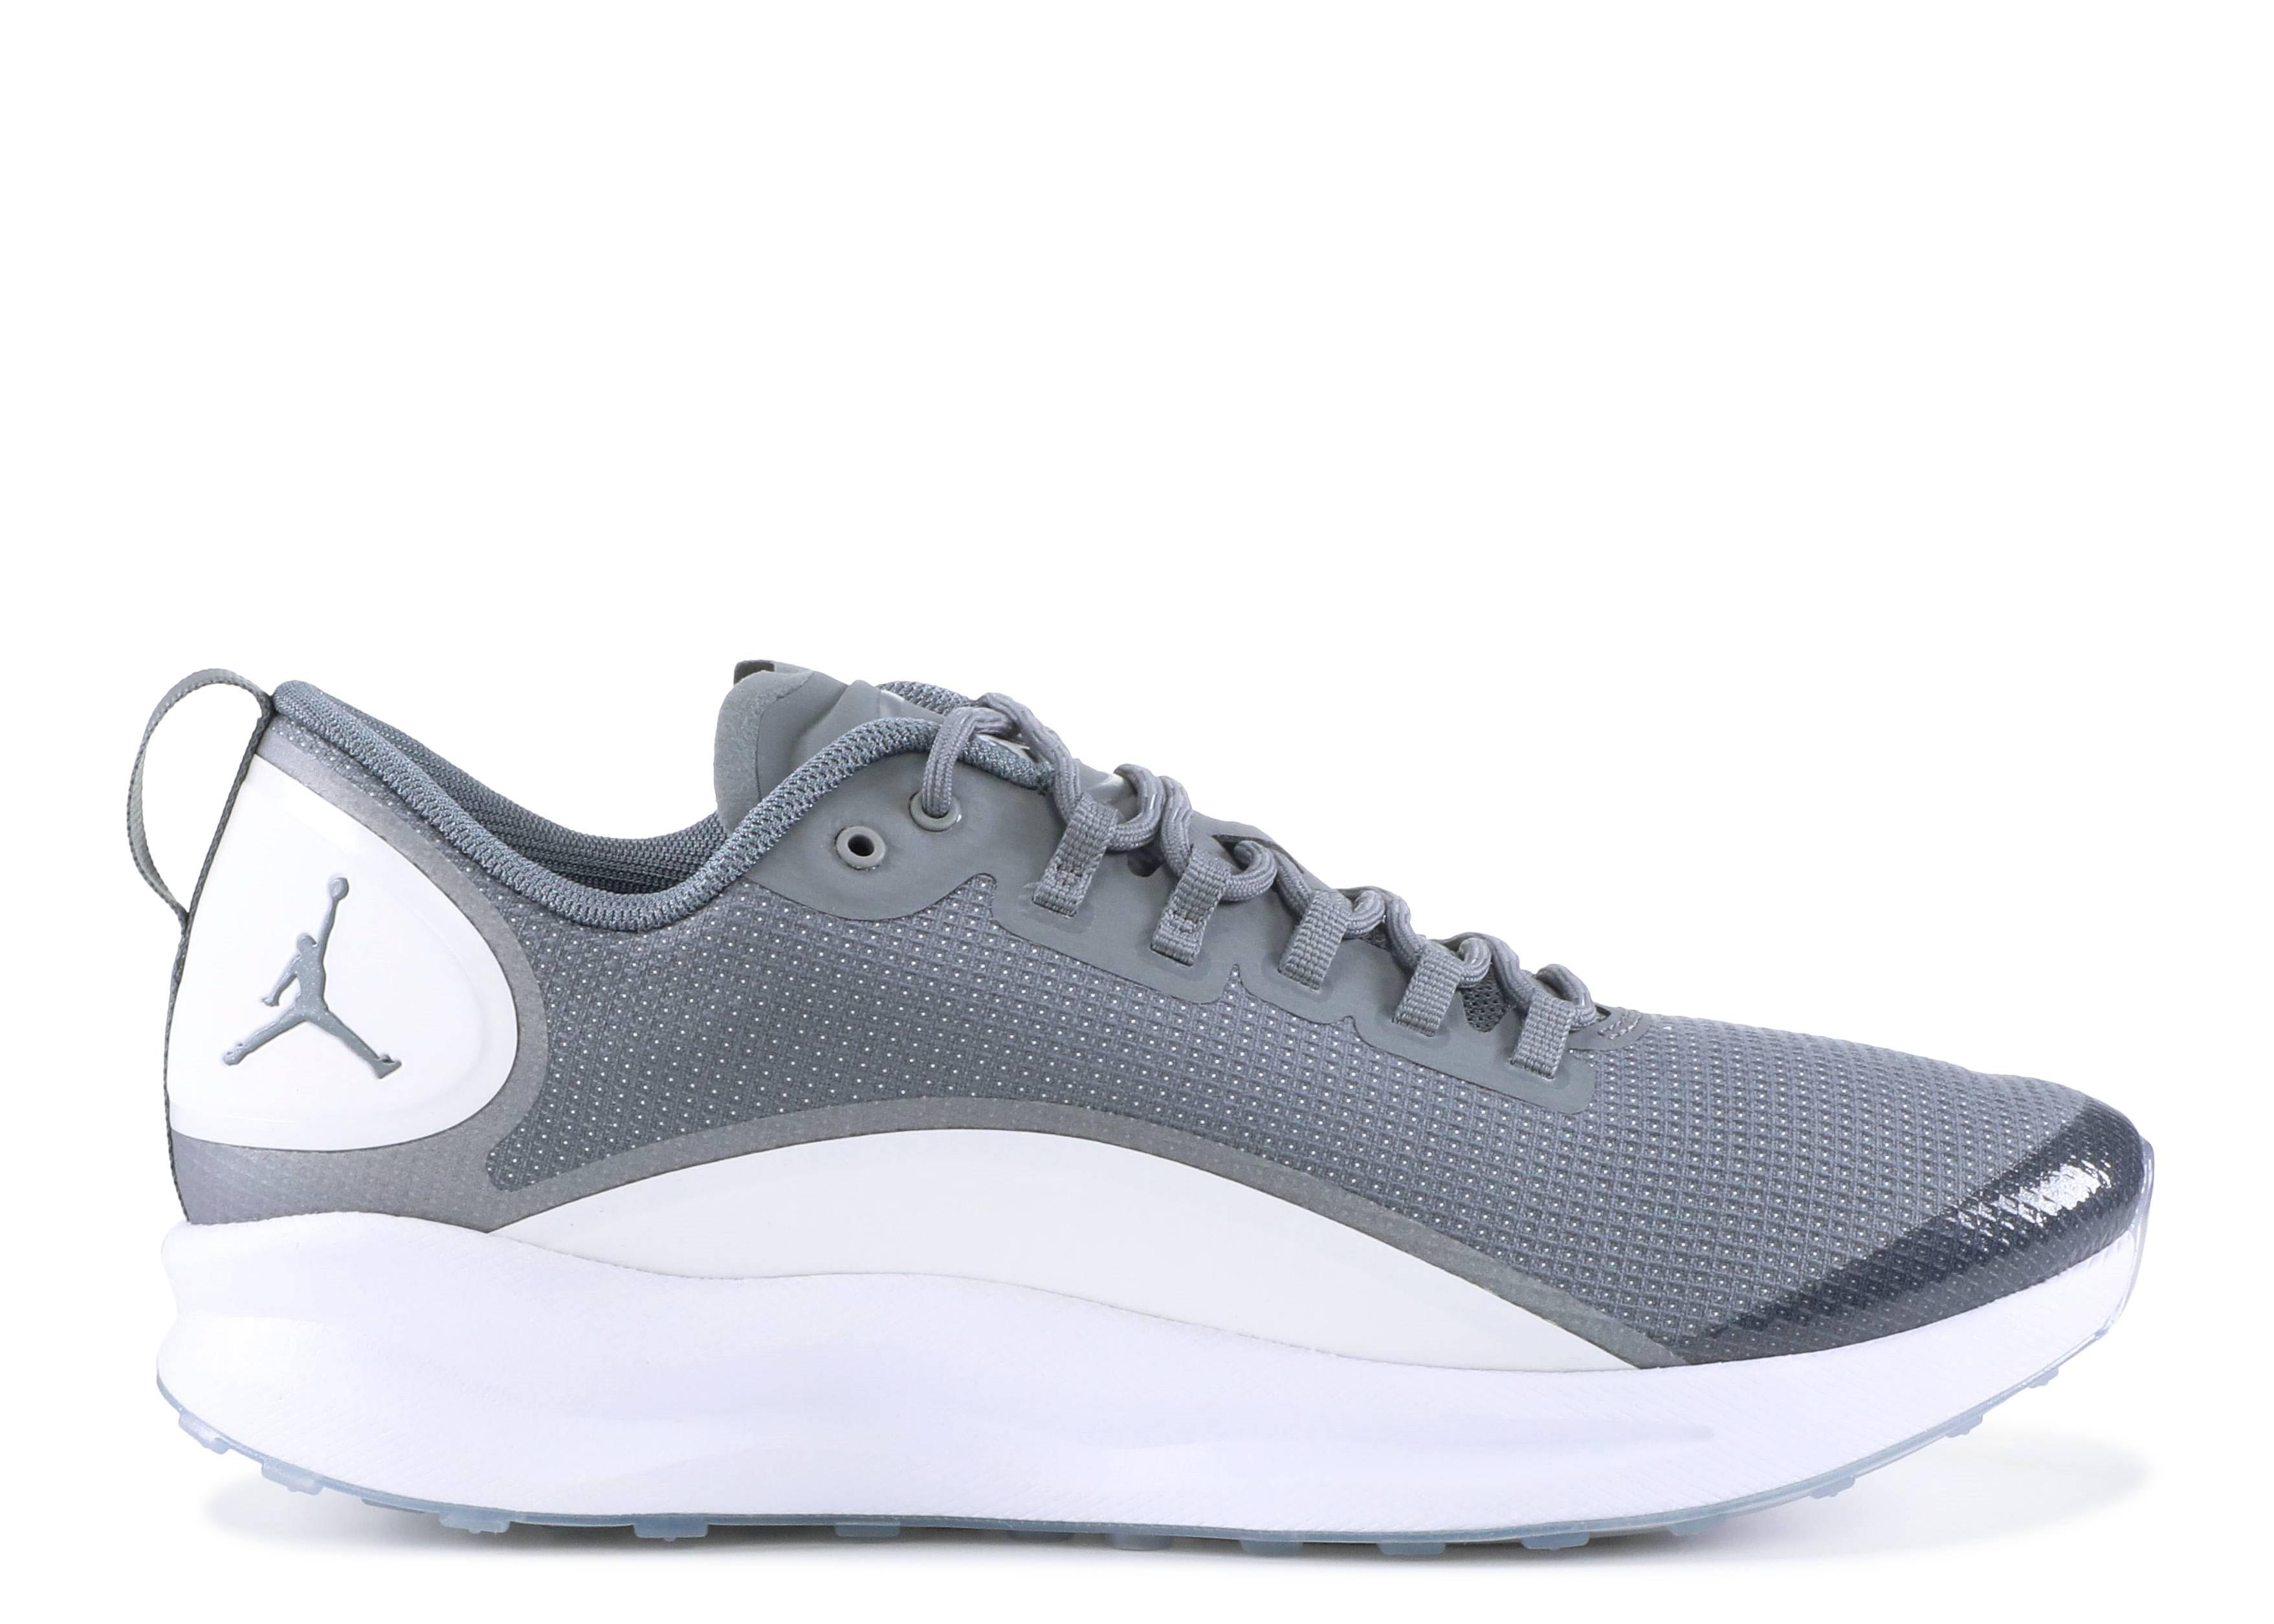 239010c9fafa62 Jordan Zoom Tenacity - Air Jordan - ah8111 003 - cool grey cool grey ...